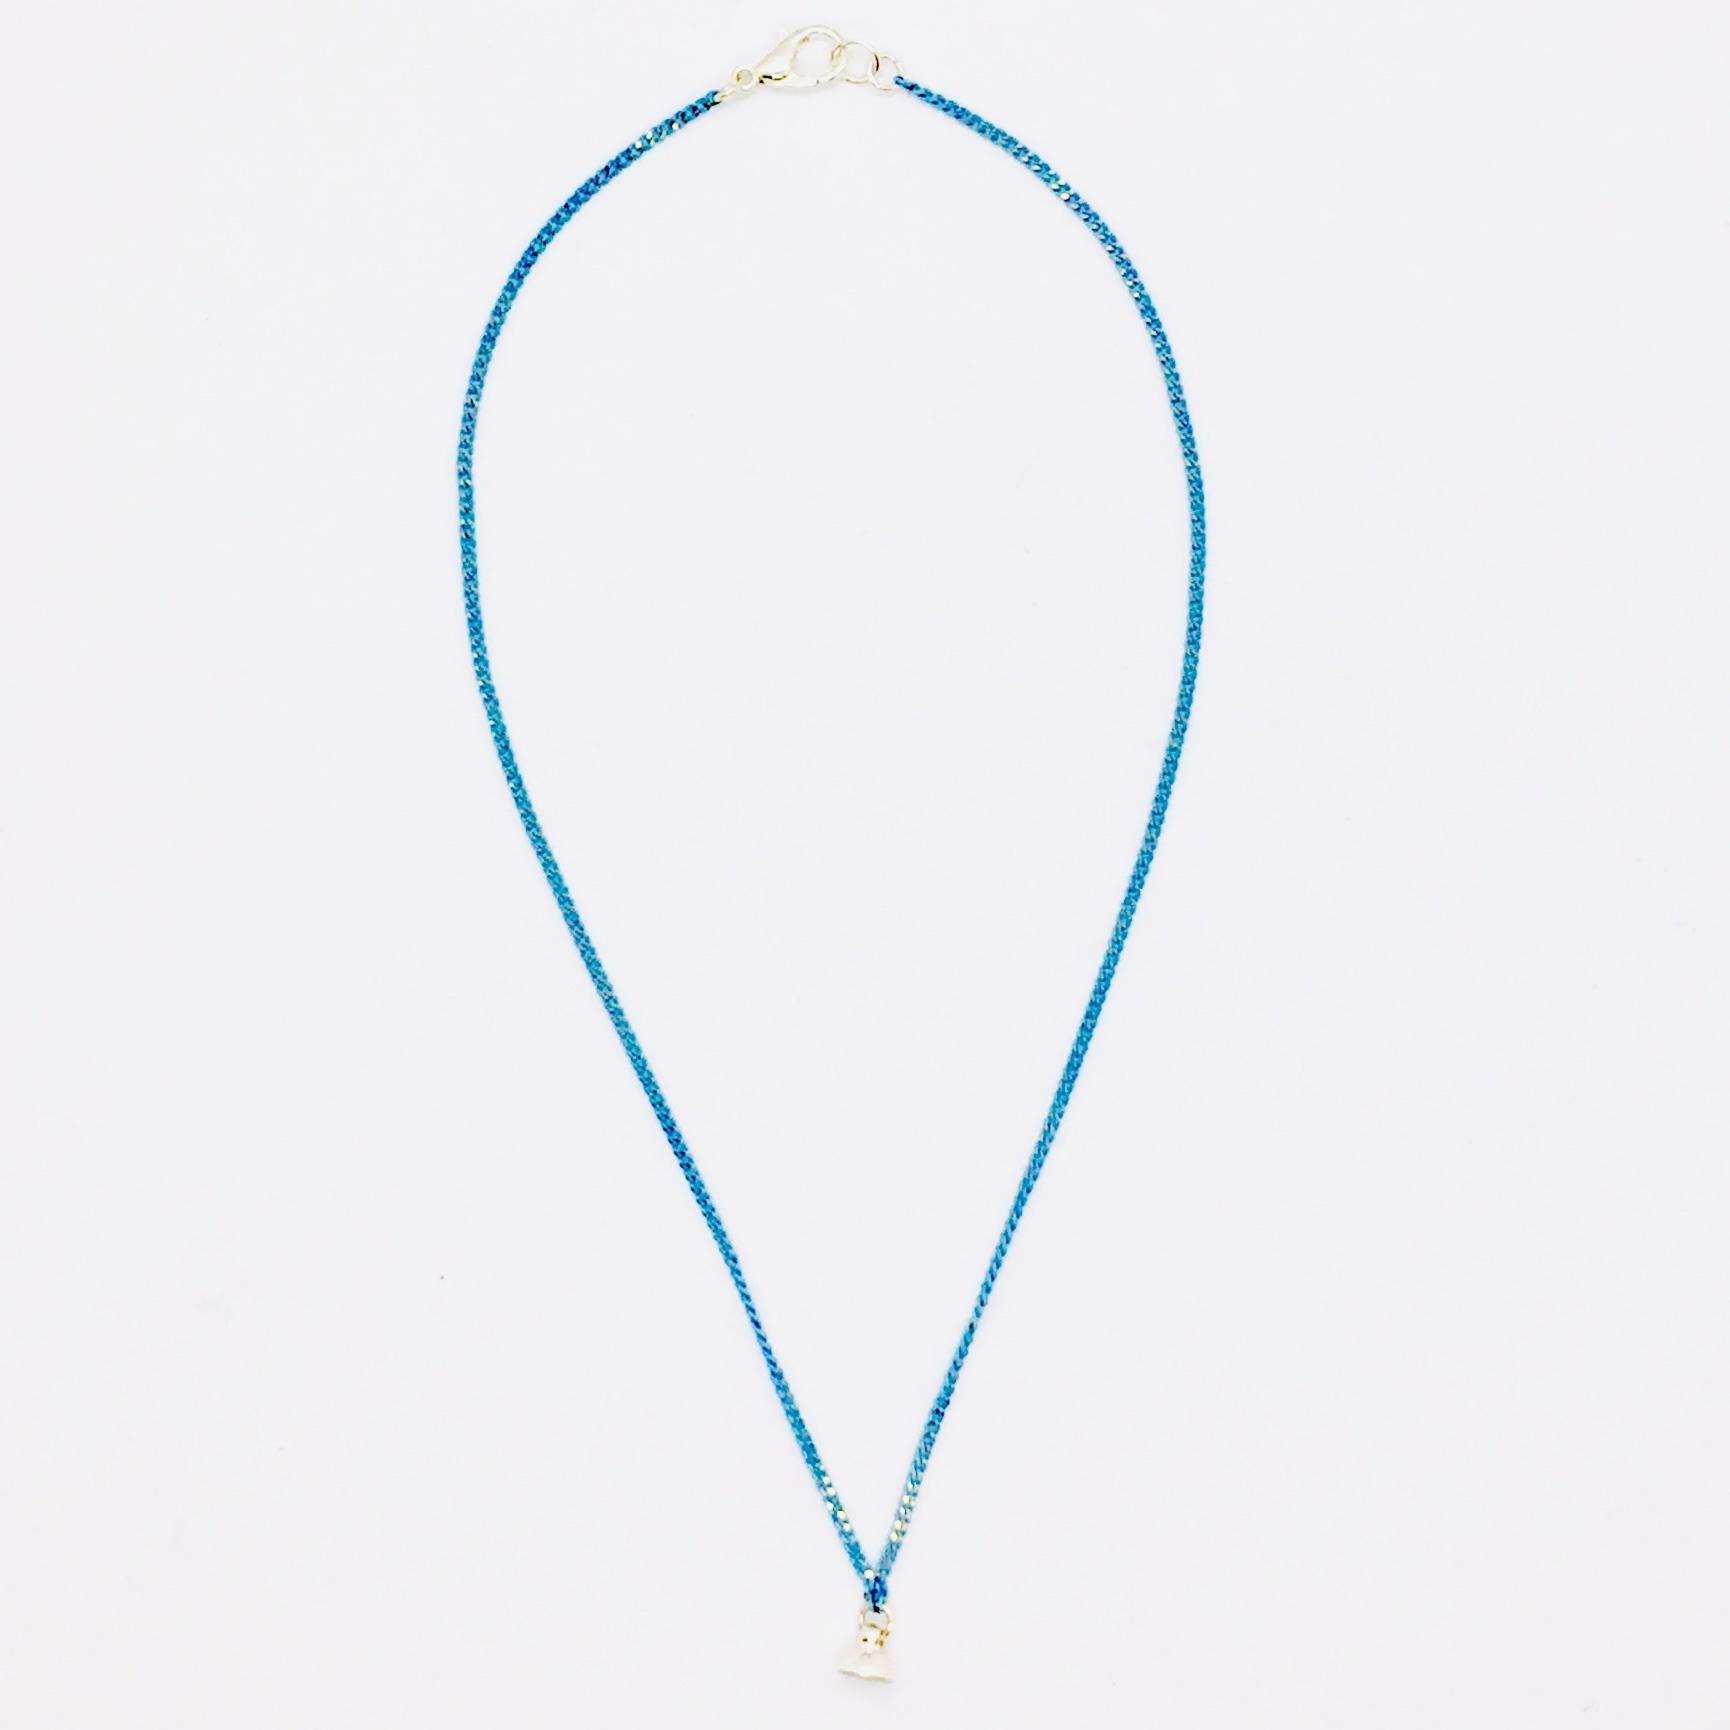 Chaine Ras de cou - Turquoise